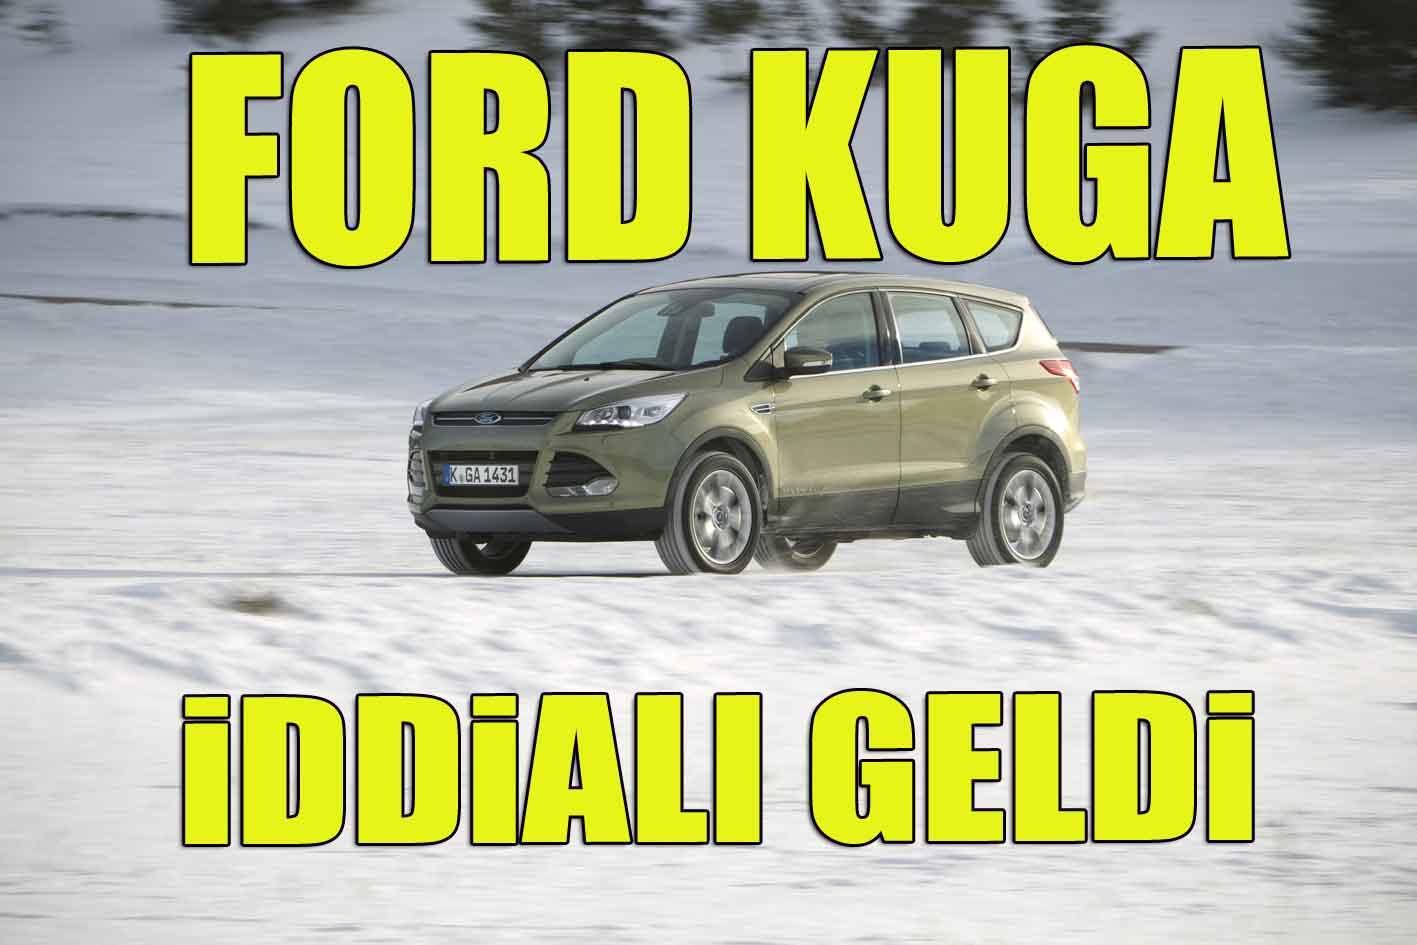 Ford Kuga çok havalı